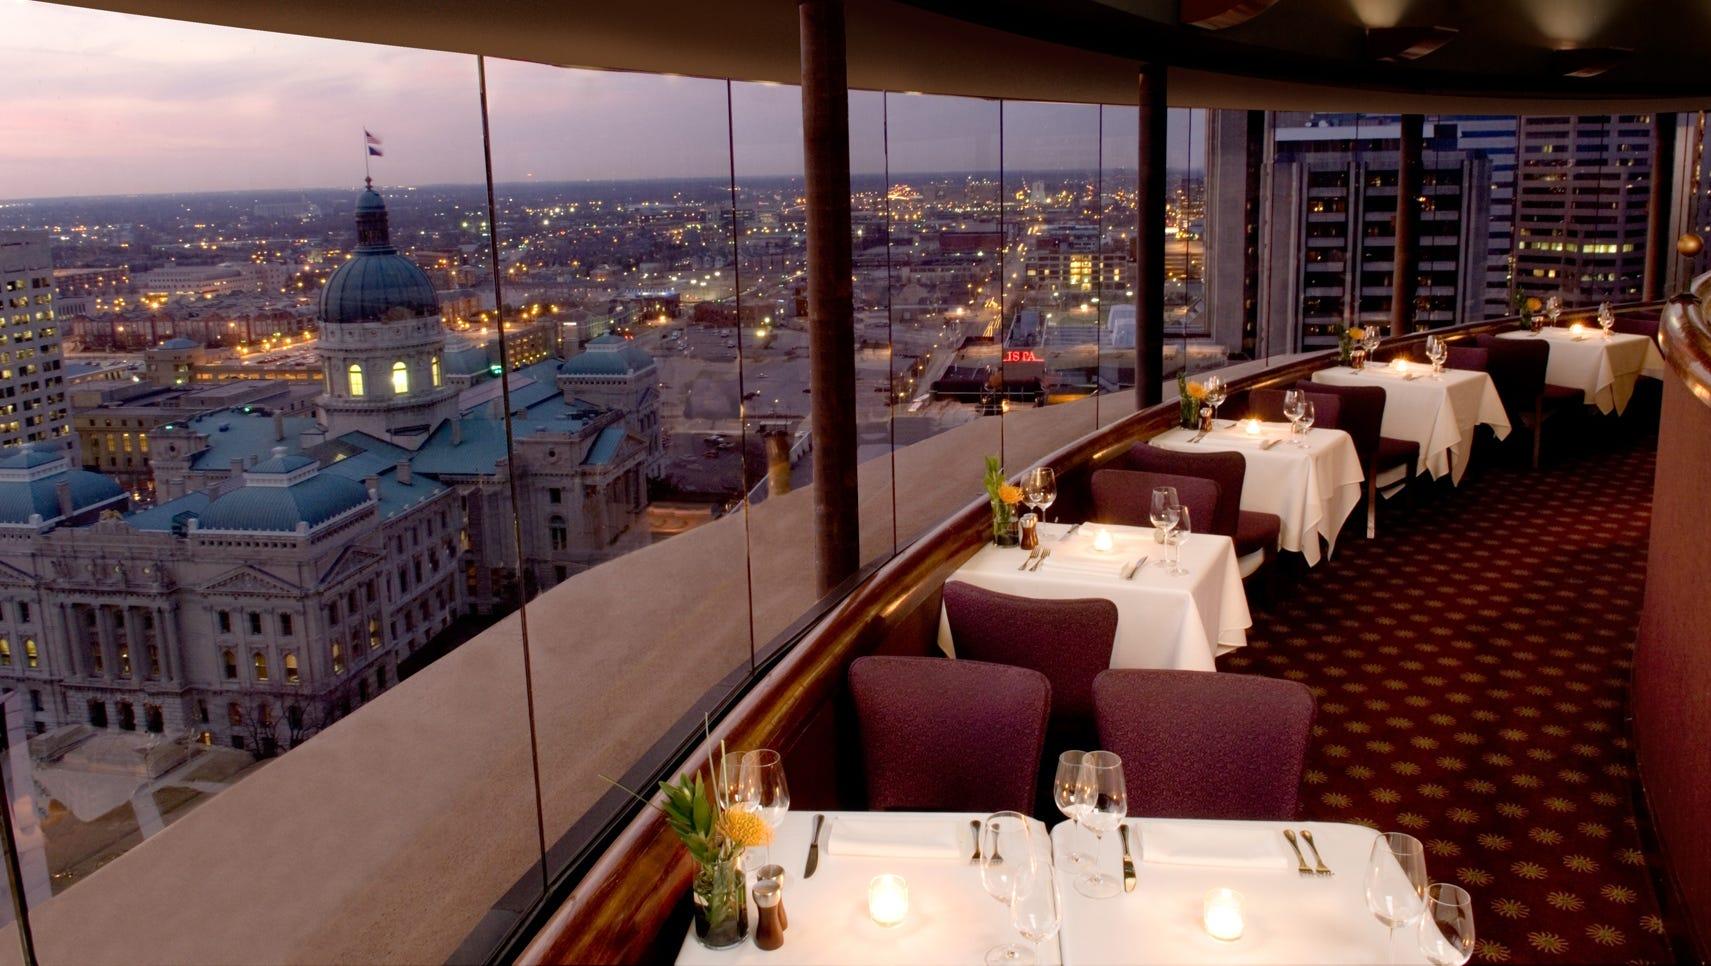 Romantic Restaurants In Indianapolis 14 Fancy Date Nights